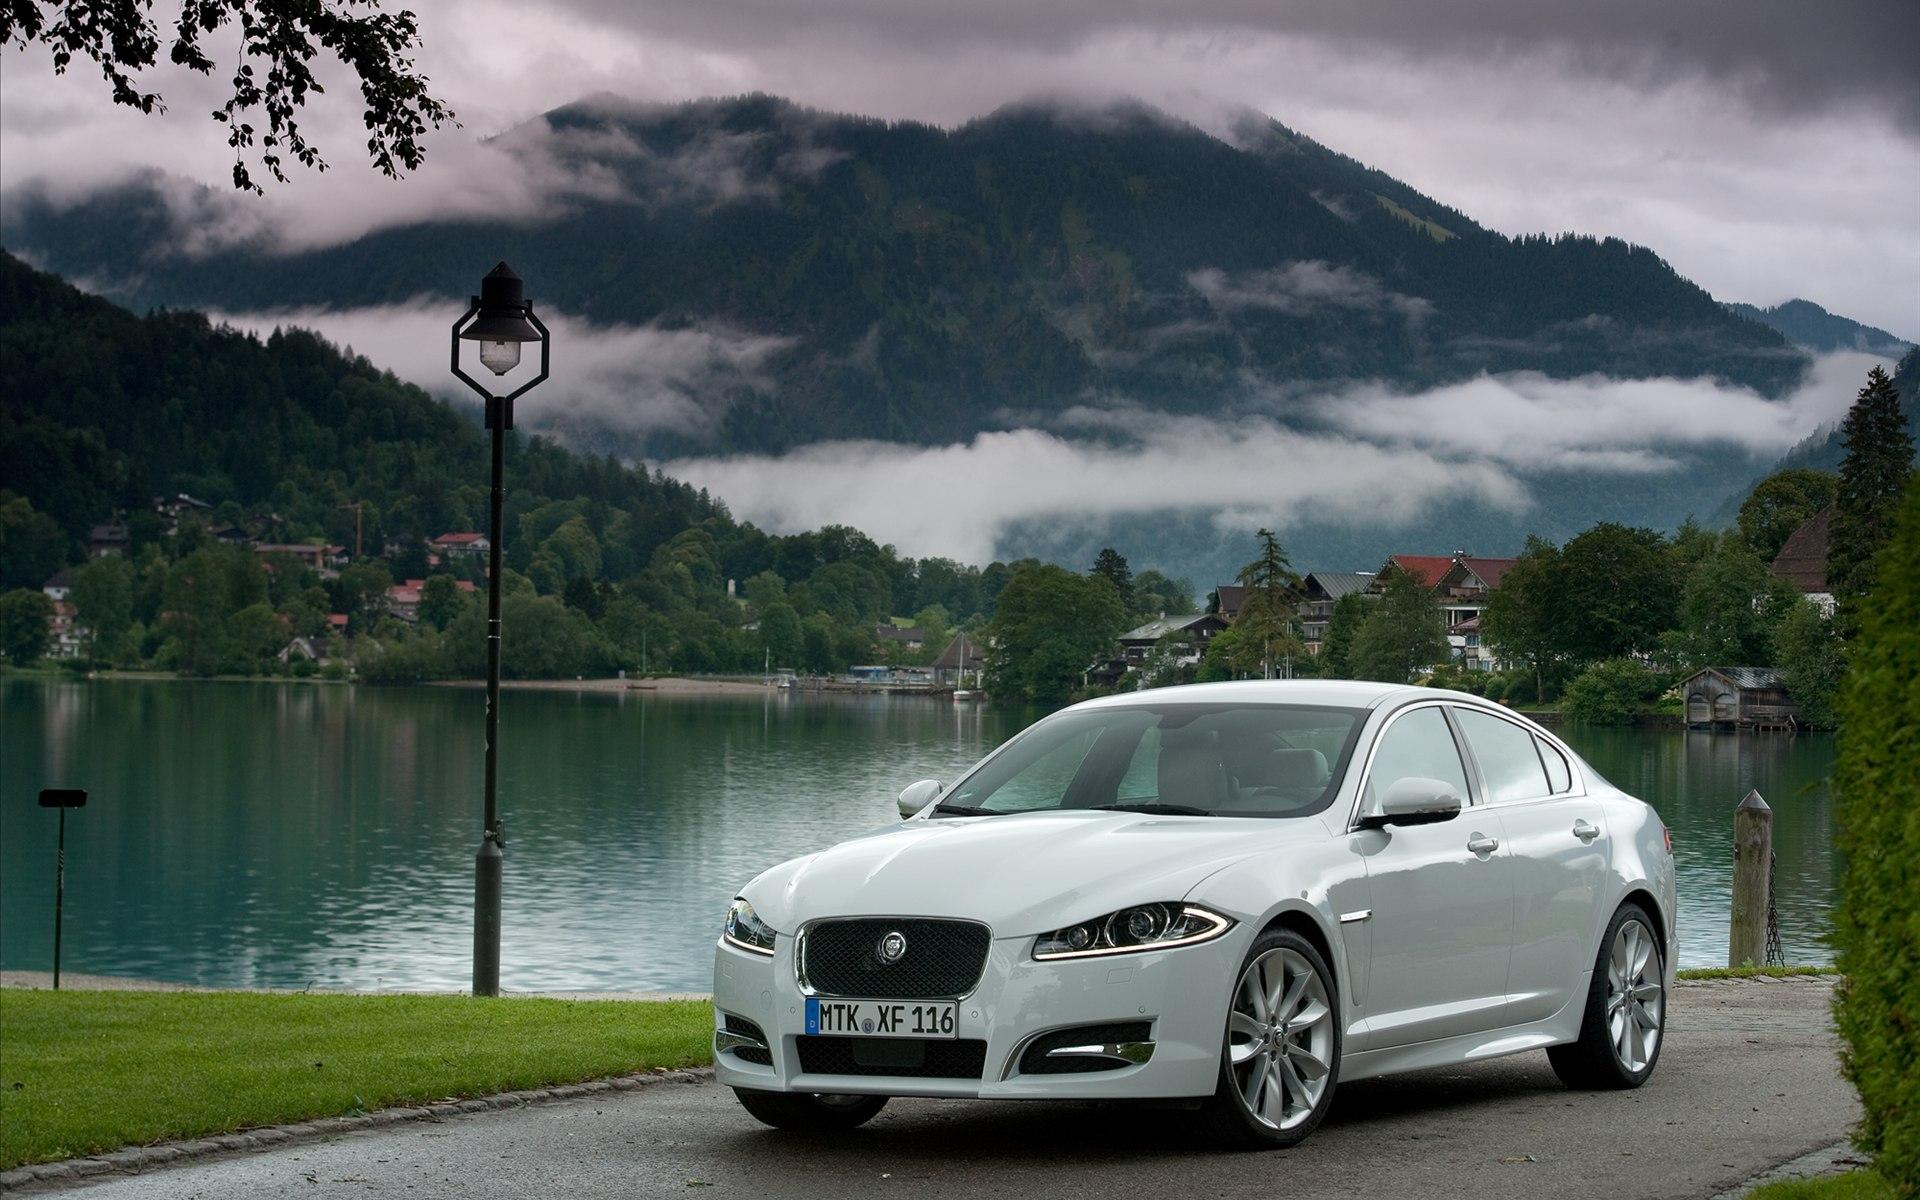 Jaguar Xf Diesel - HD Desktop Wallpapers